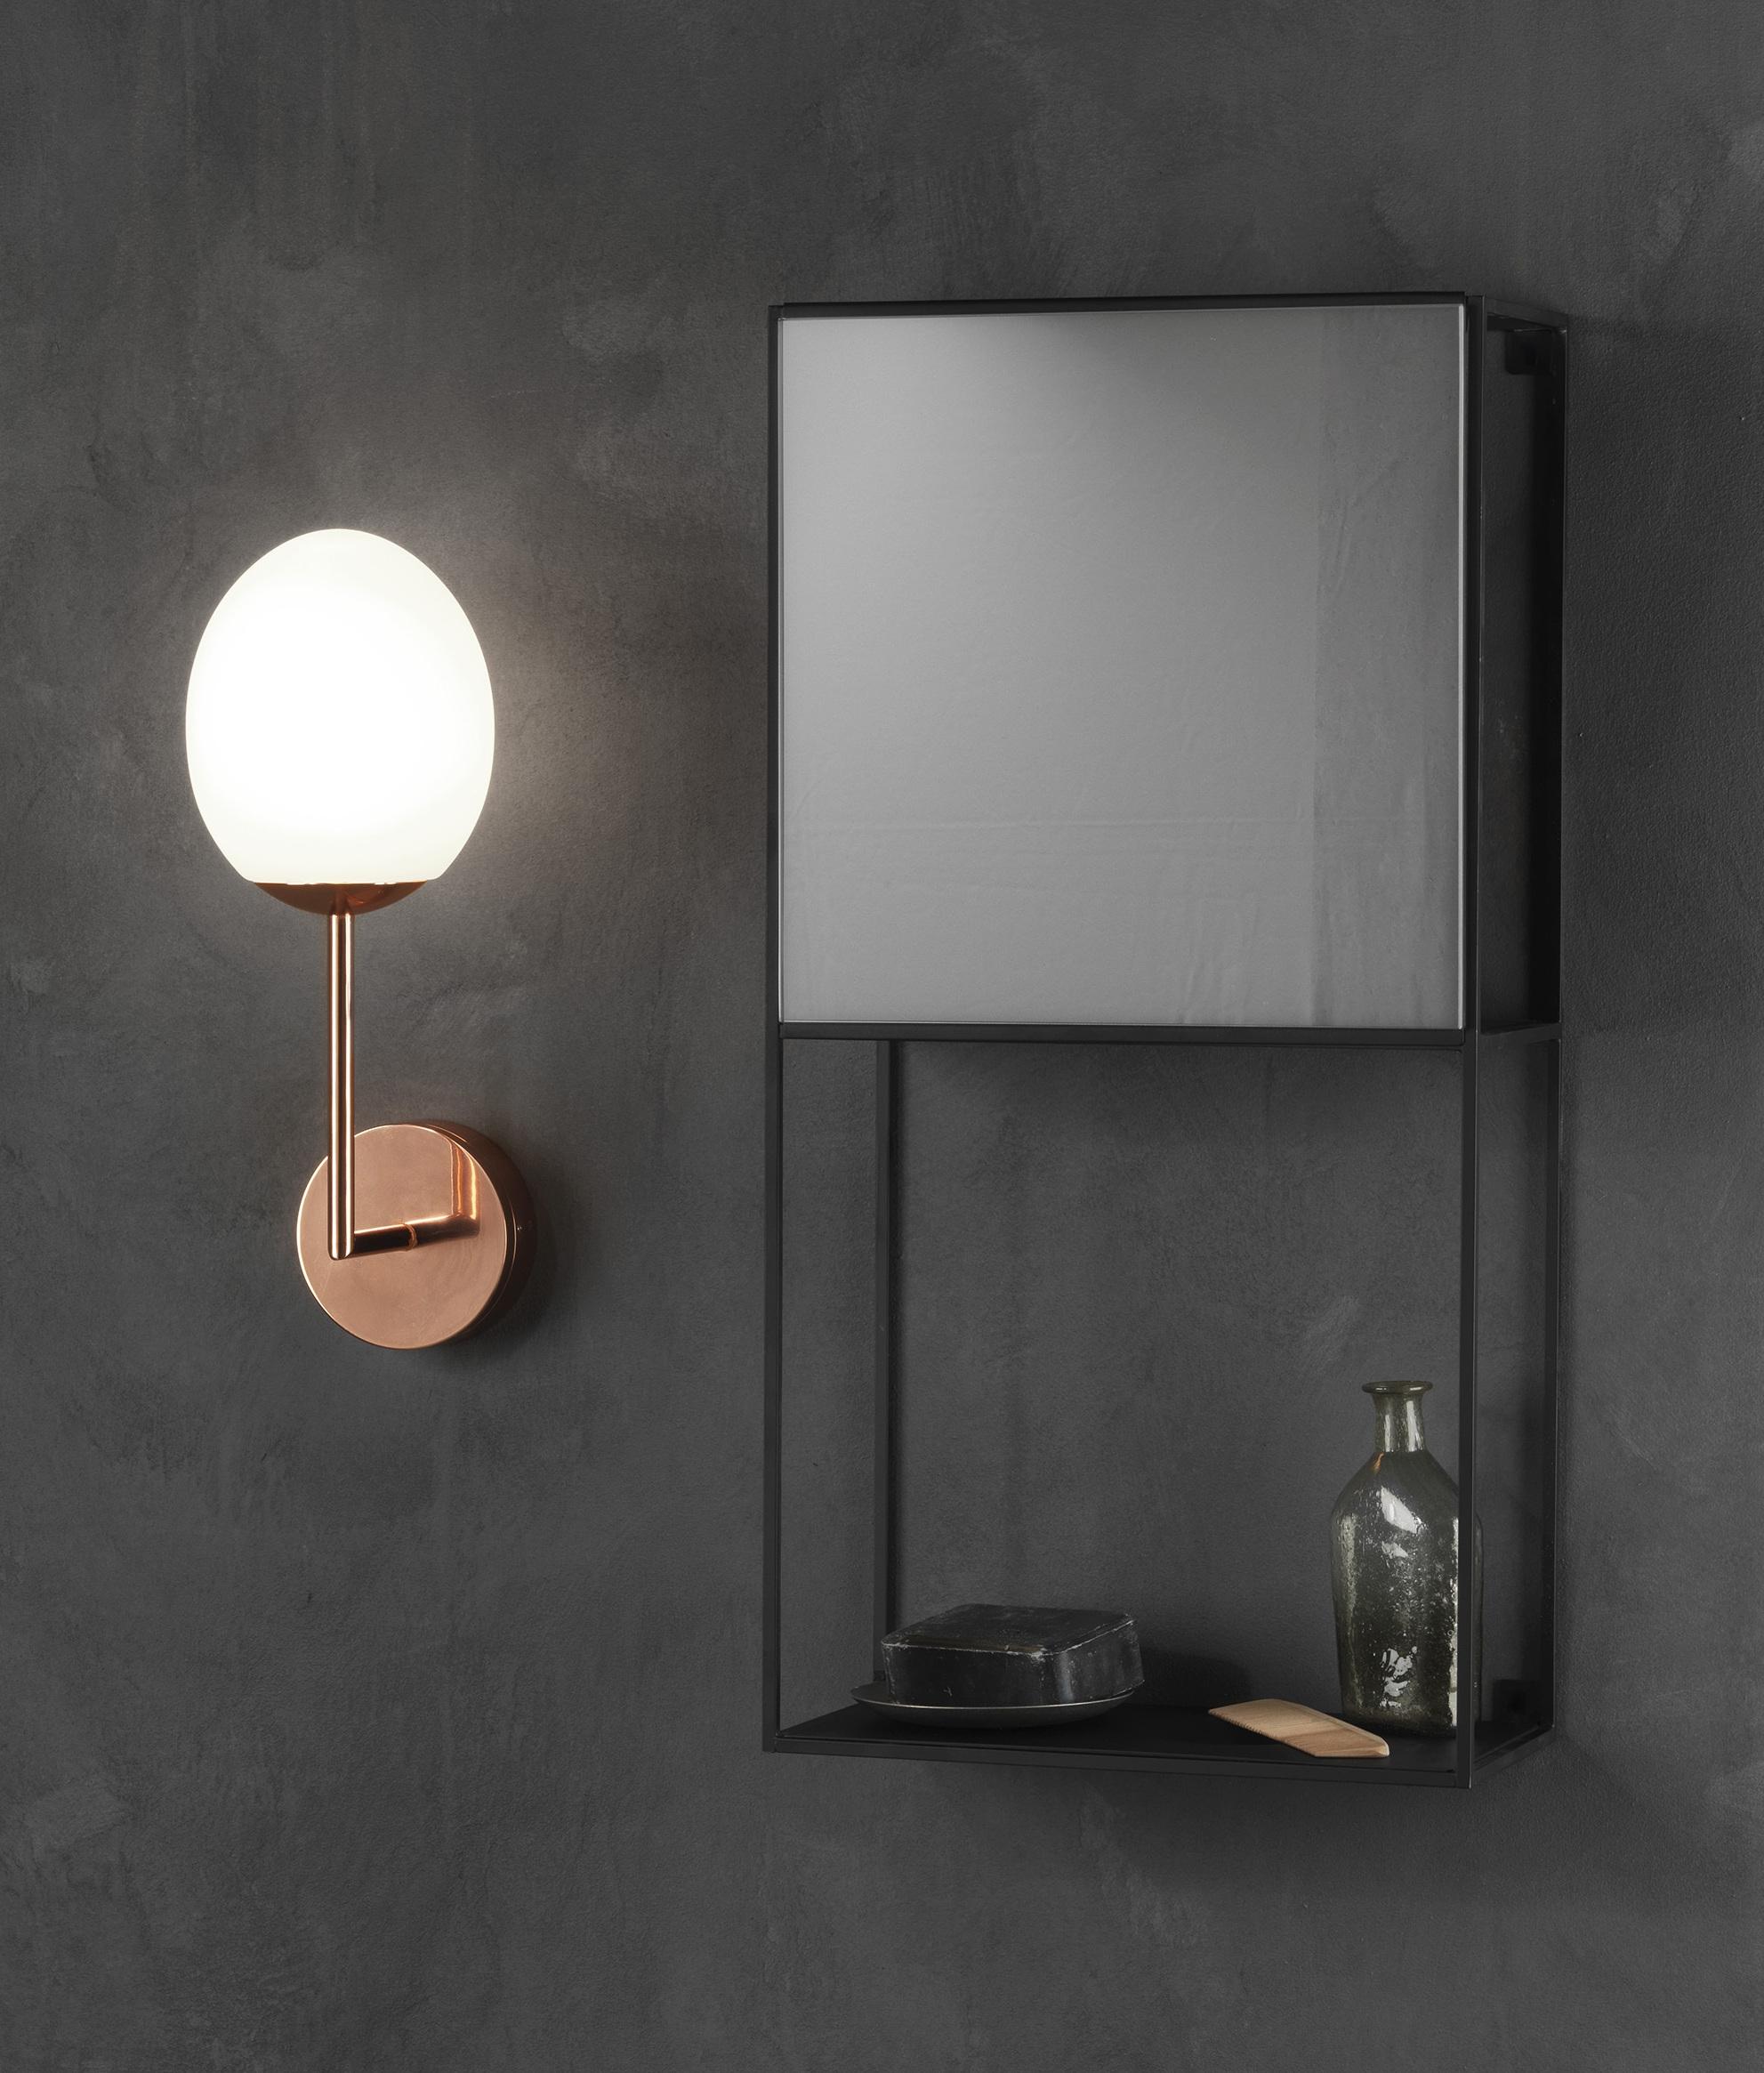 Egg Shape Glass Led Wall Light Ip44 Rated